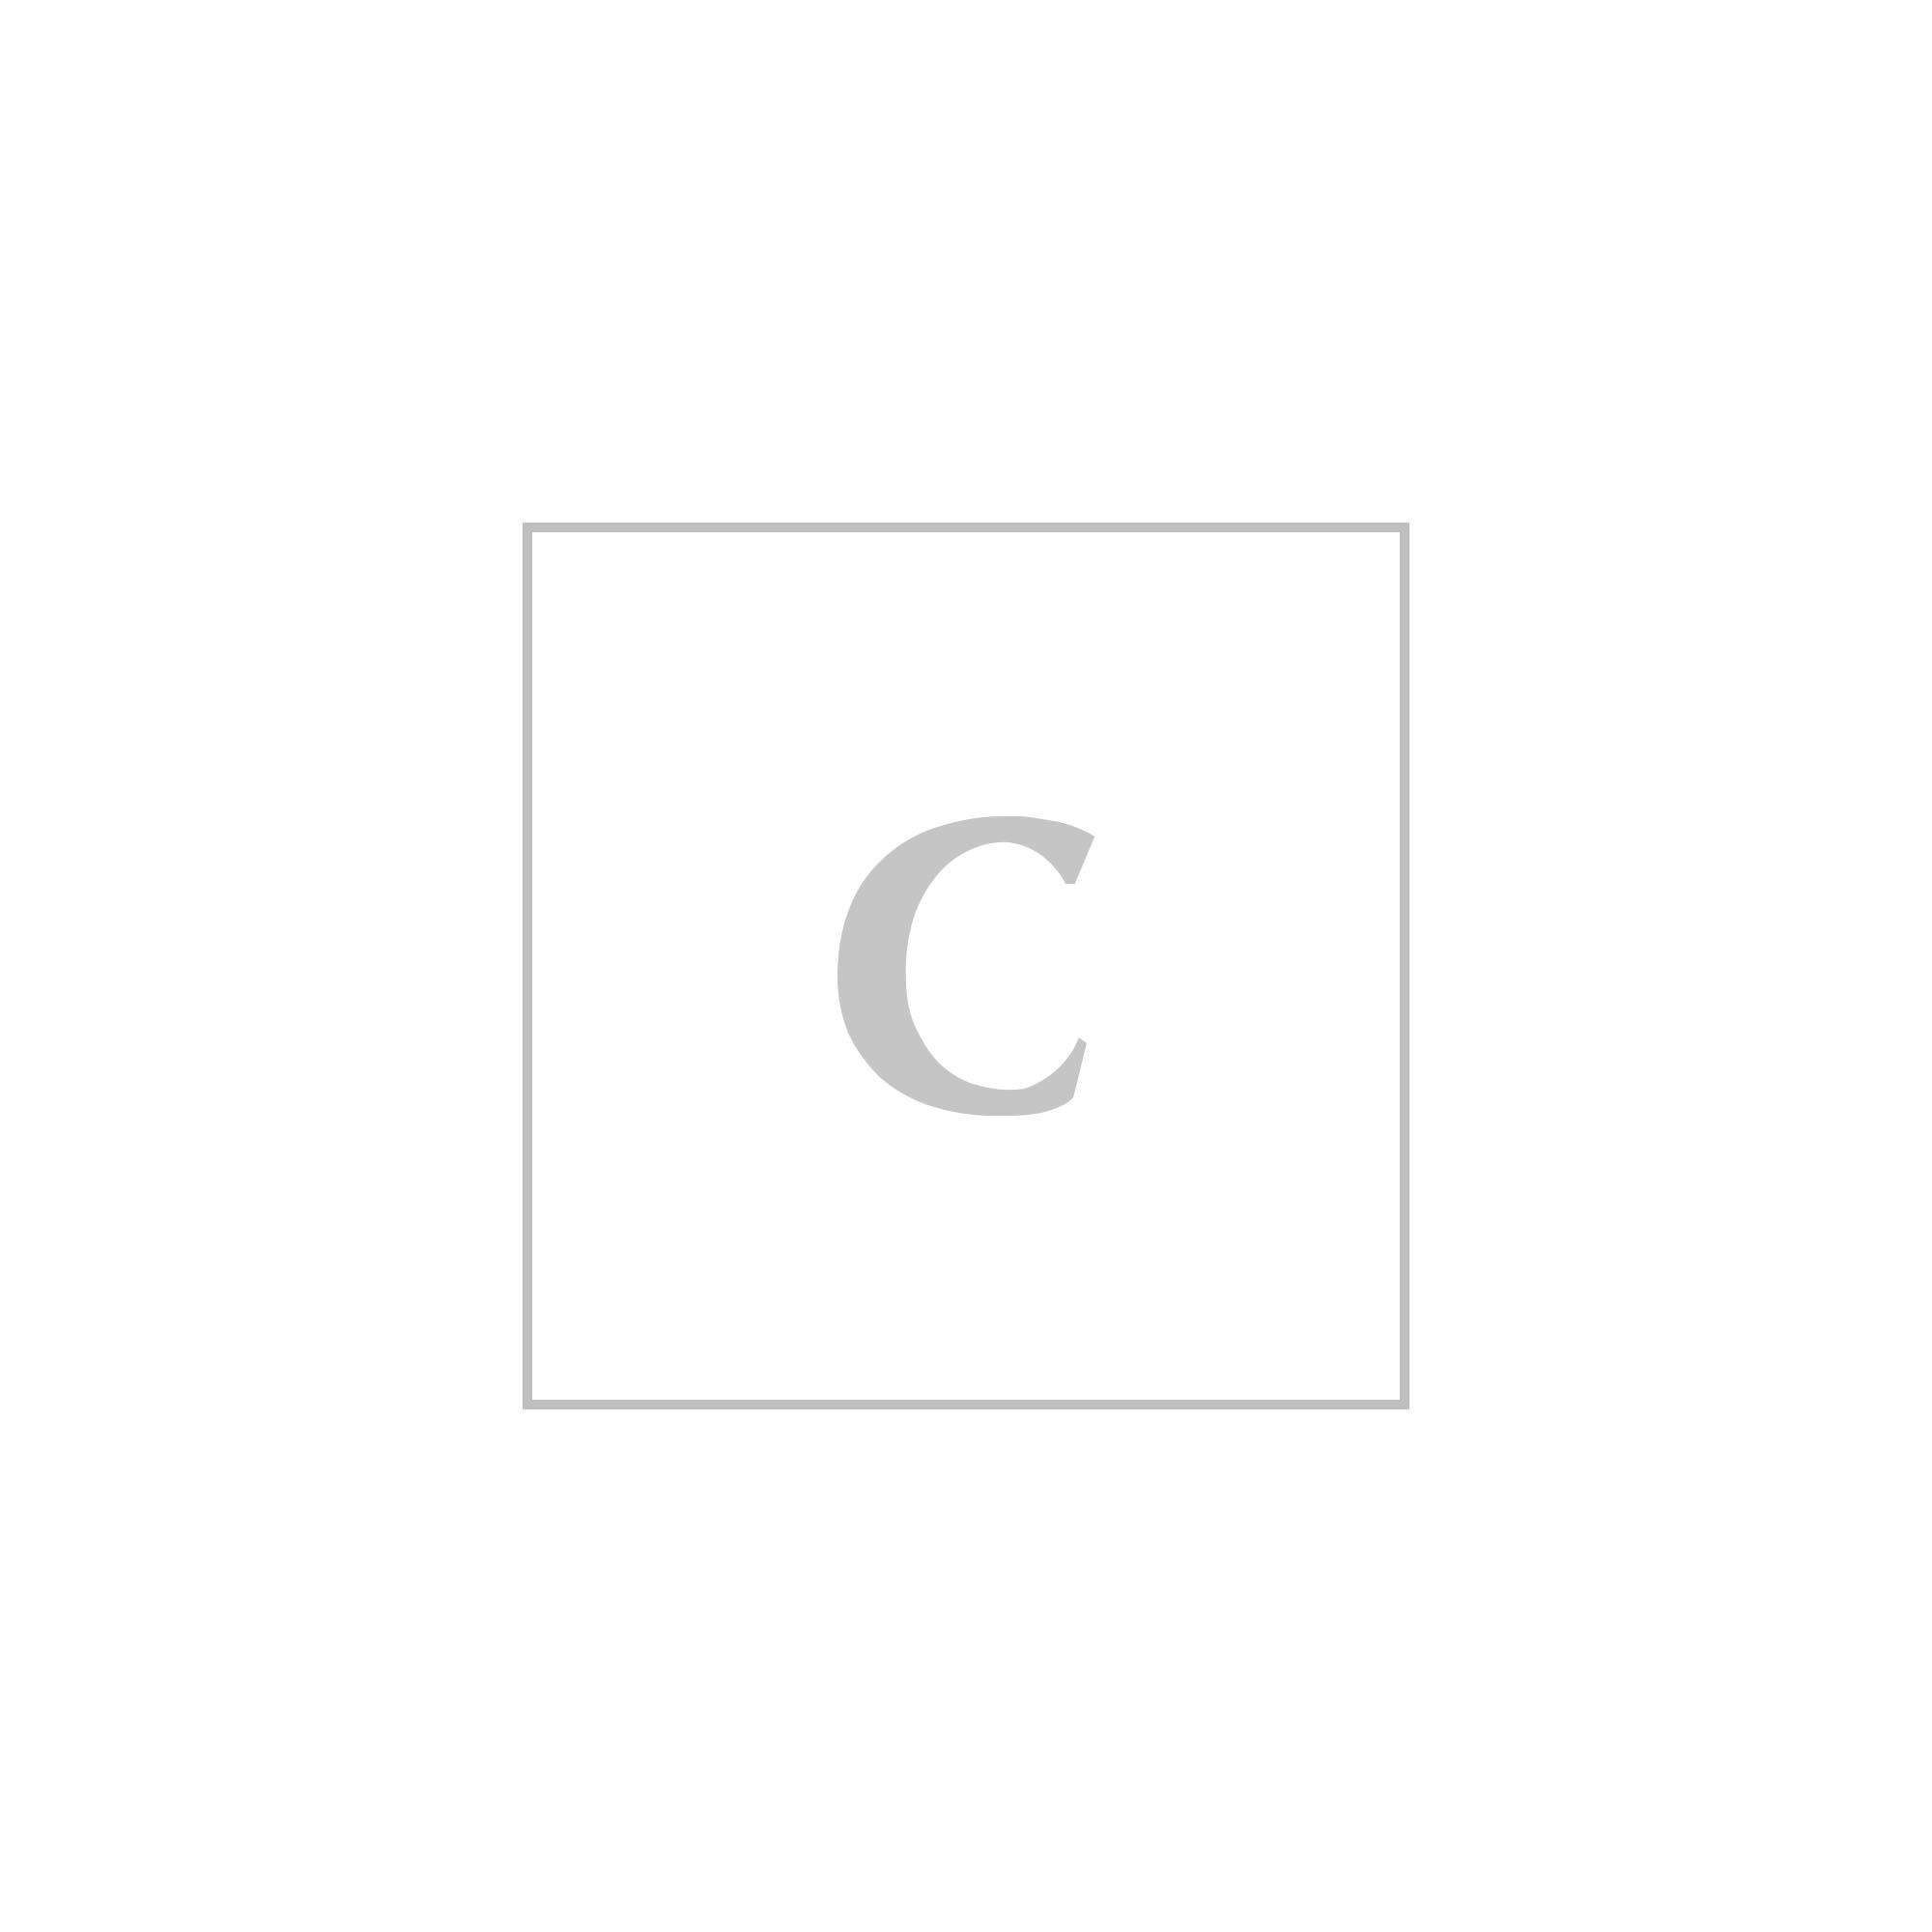 Moncler sawtell parka